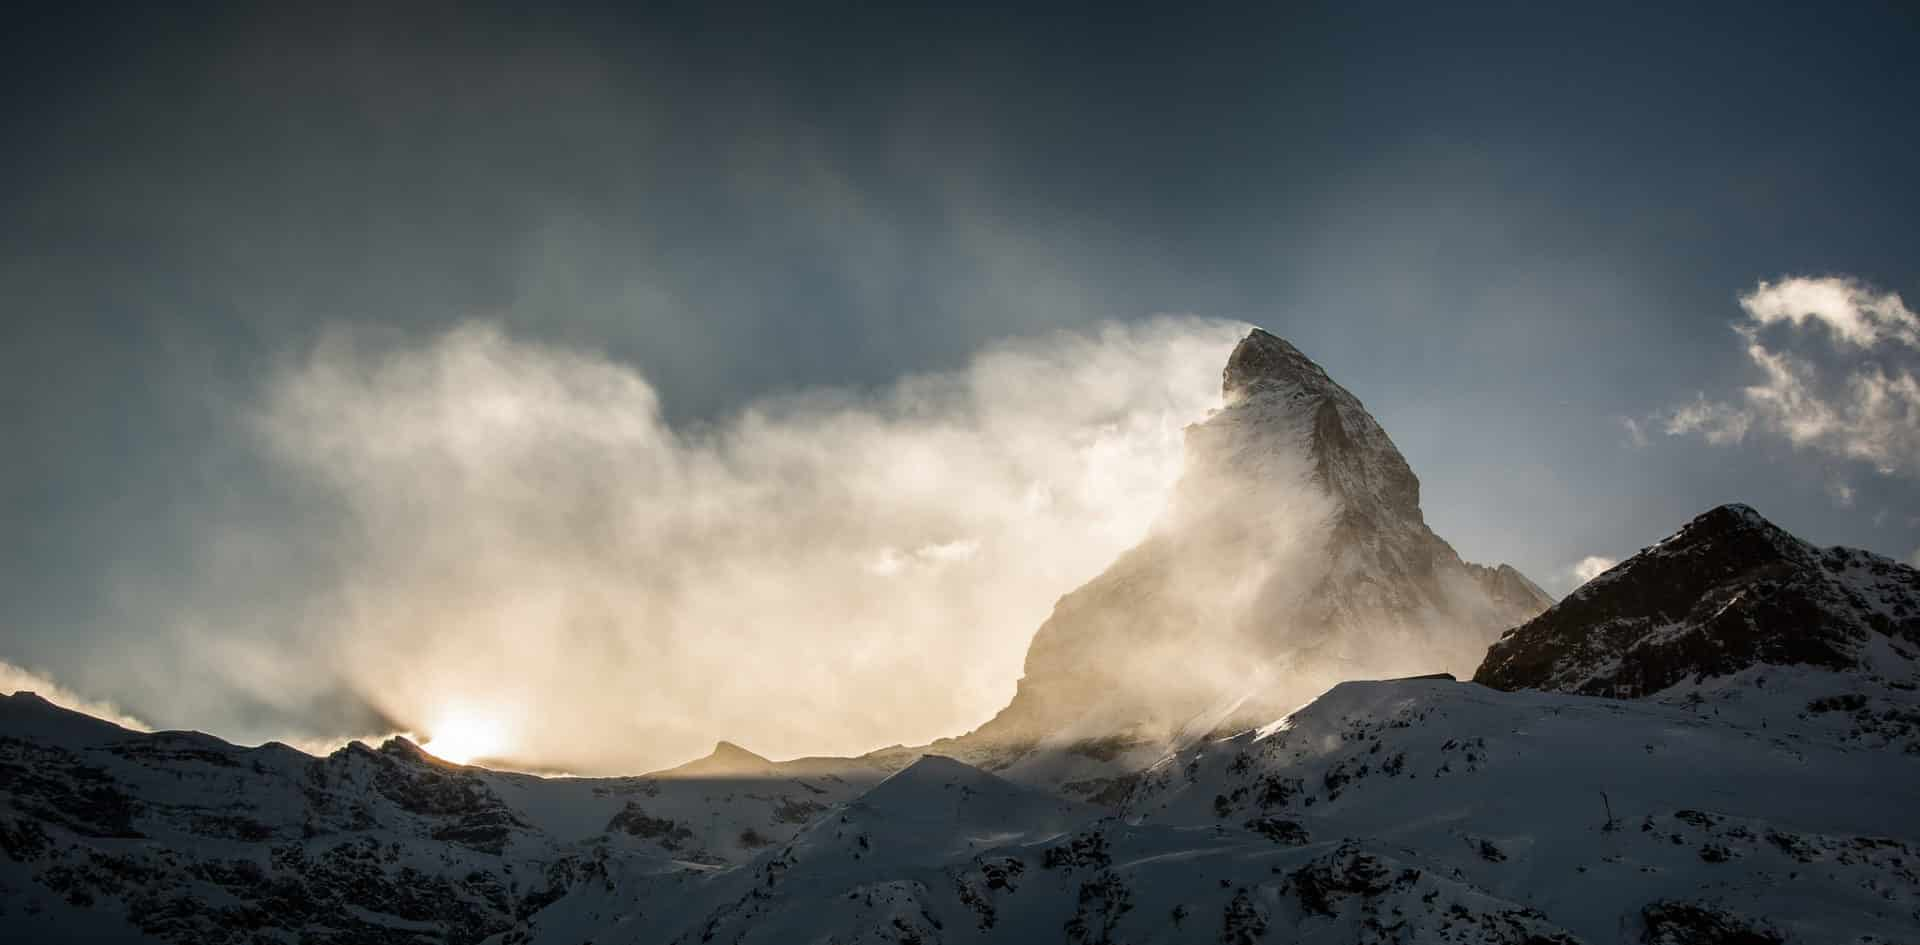 Climbing Matterhorn via the normal route